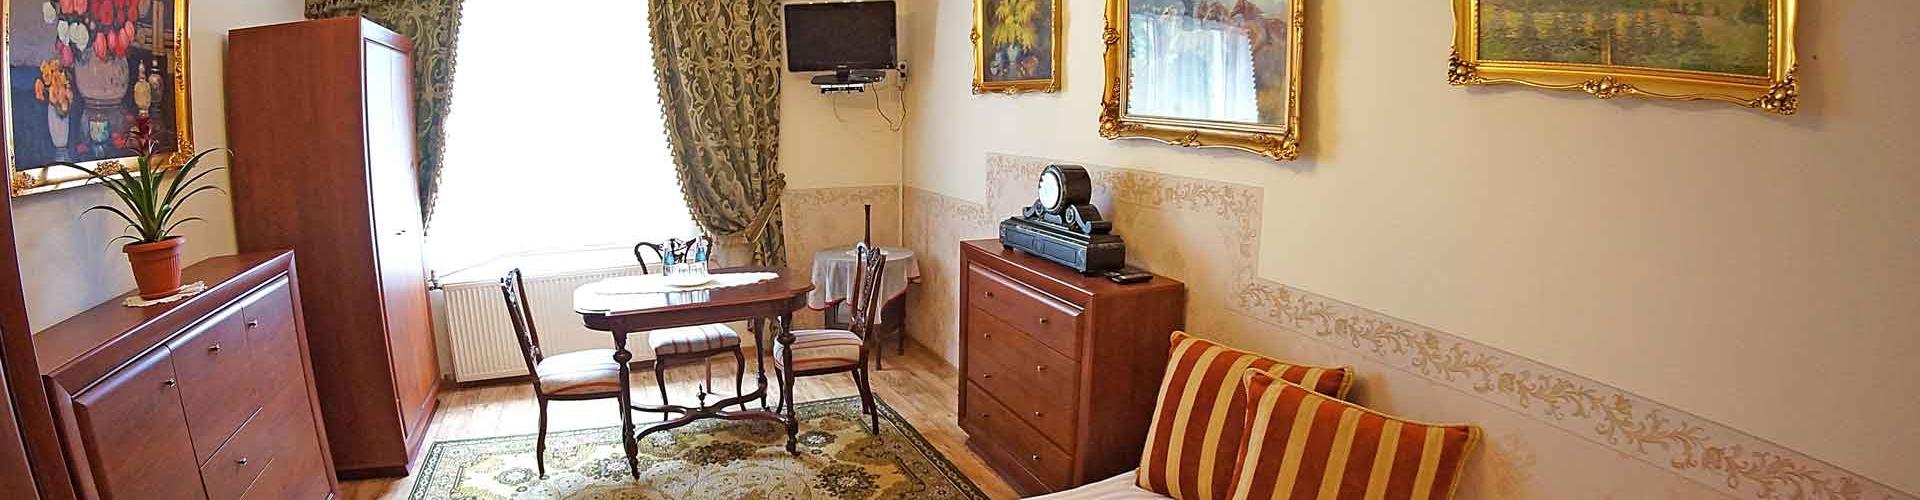 hotele w krakowie florian